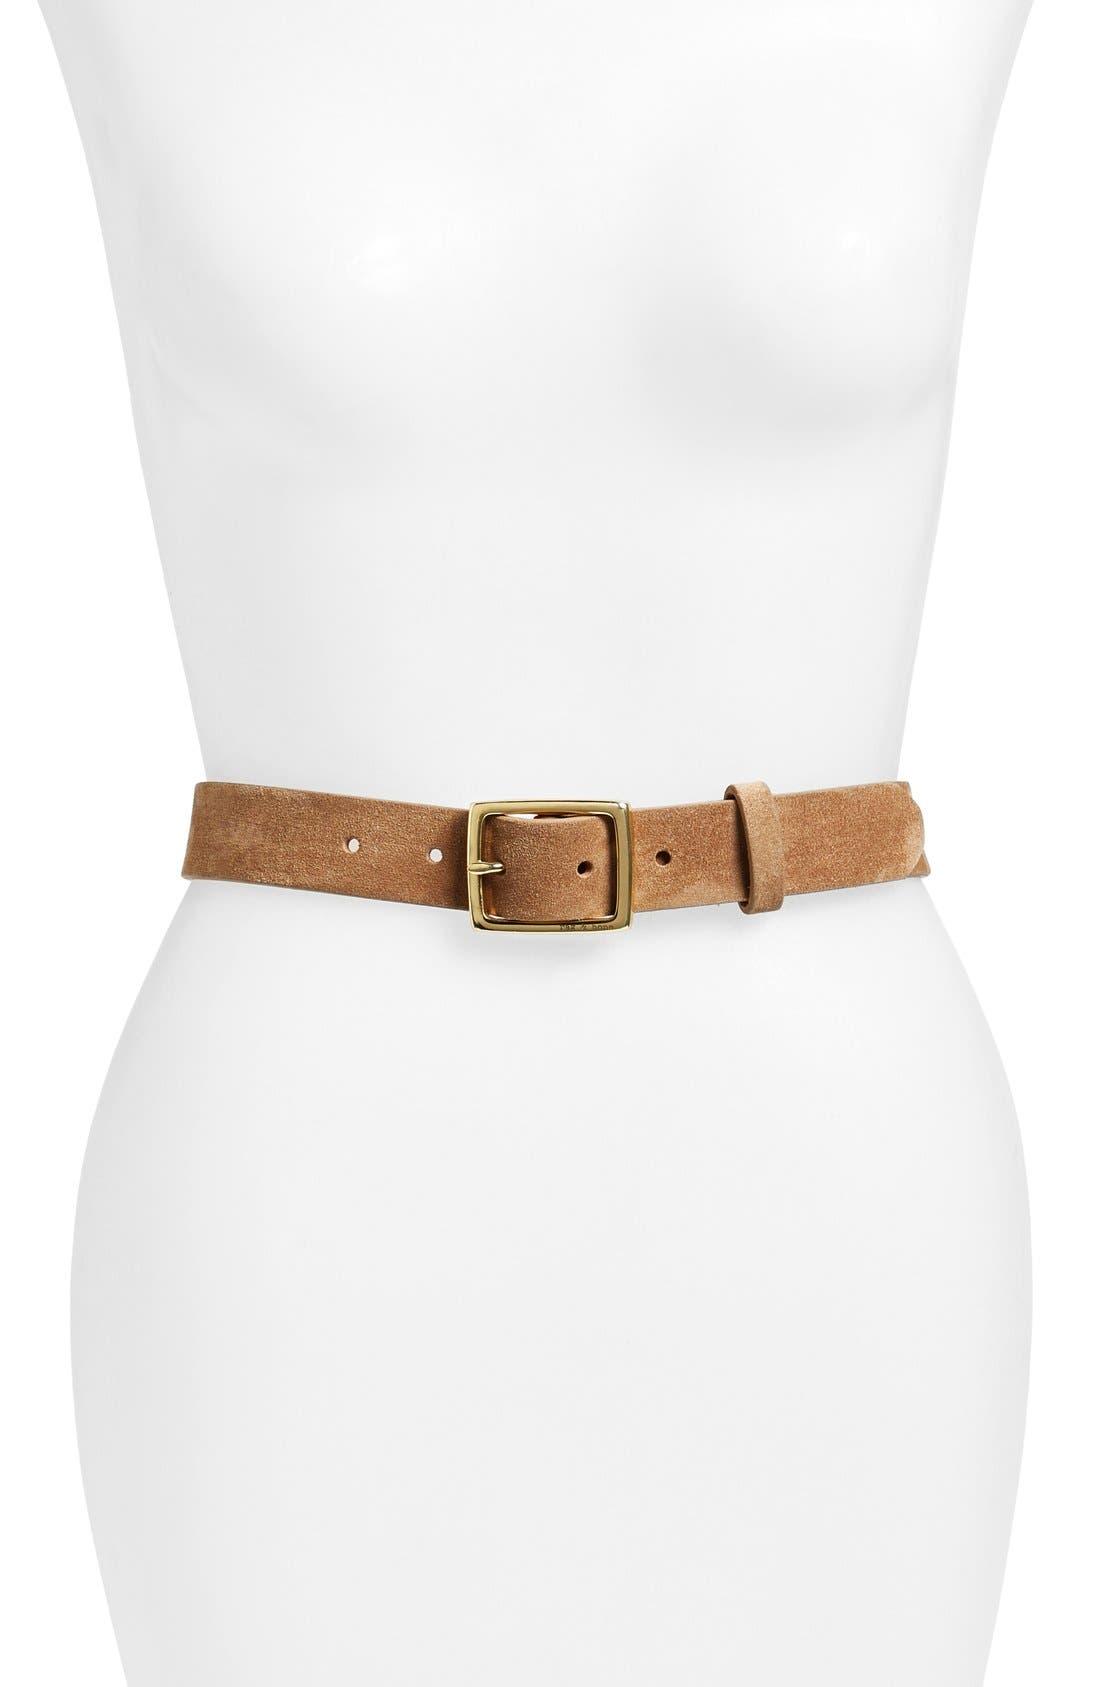 Alternate Image 1 Selected - rag & bone 'Boyfriend' Leather Belt